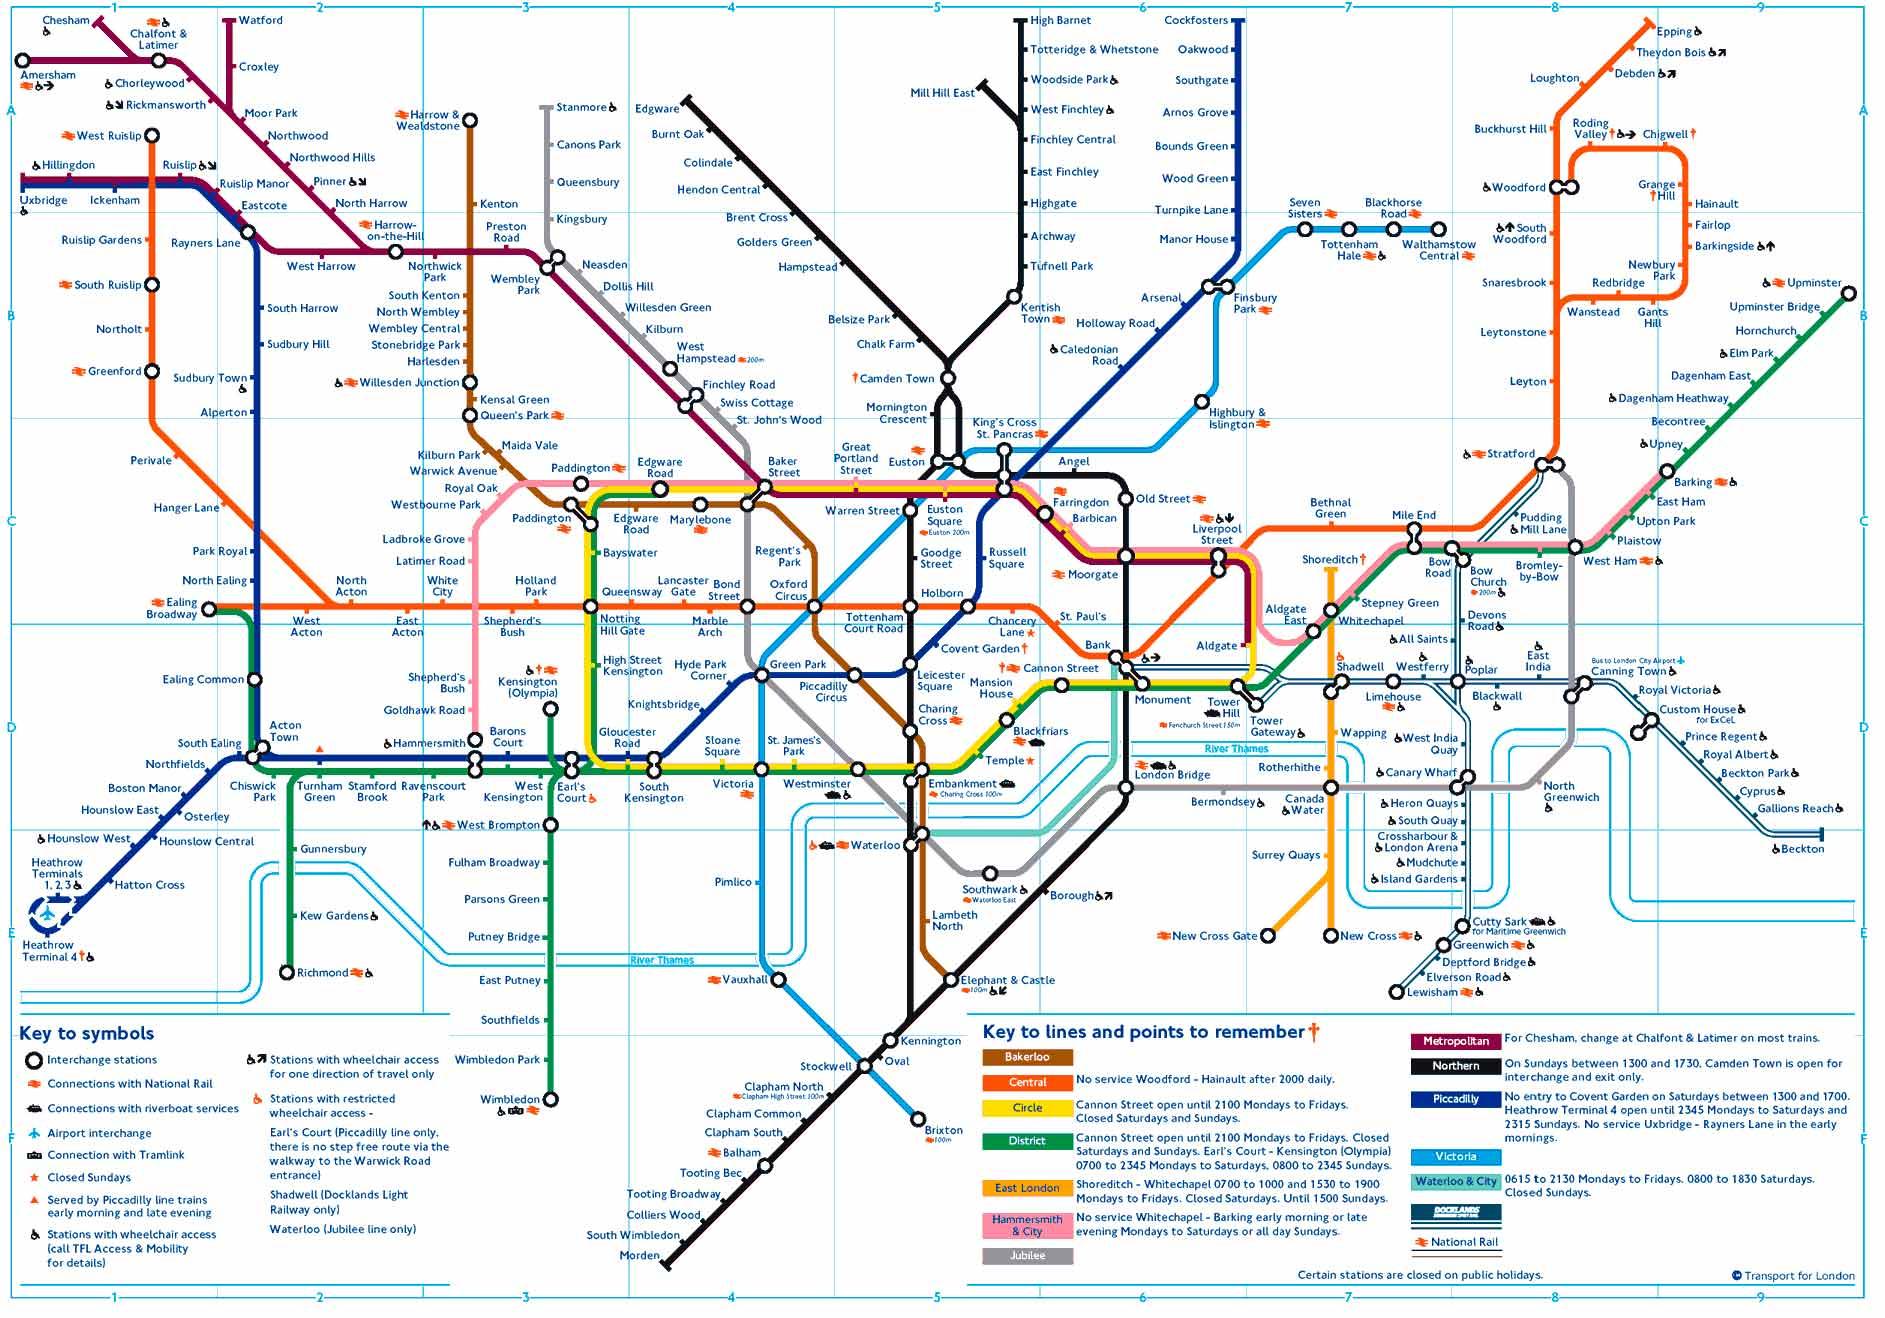 Plano Metro de Londres completo